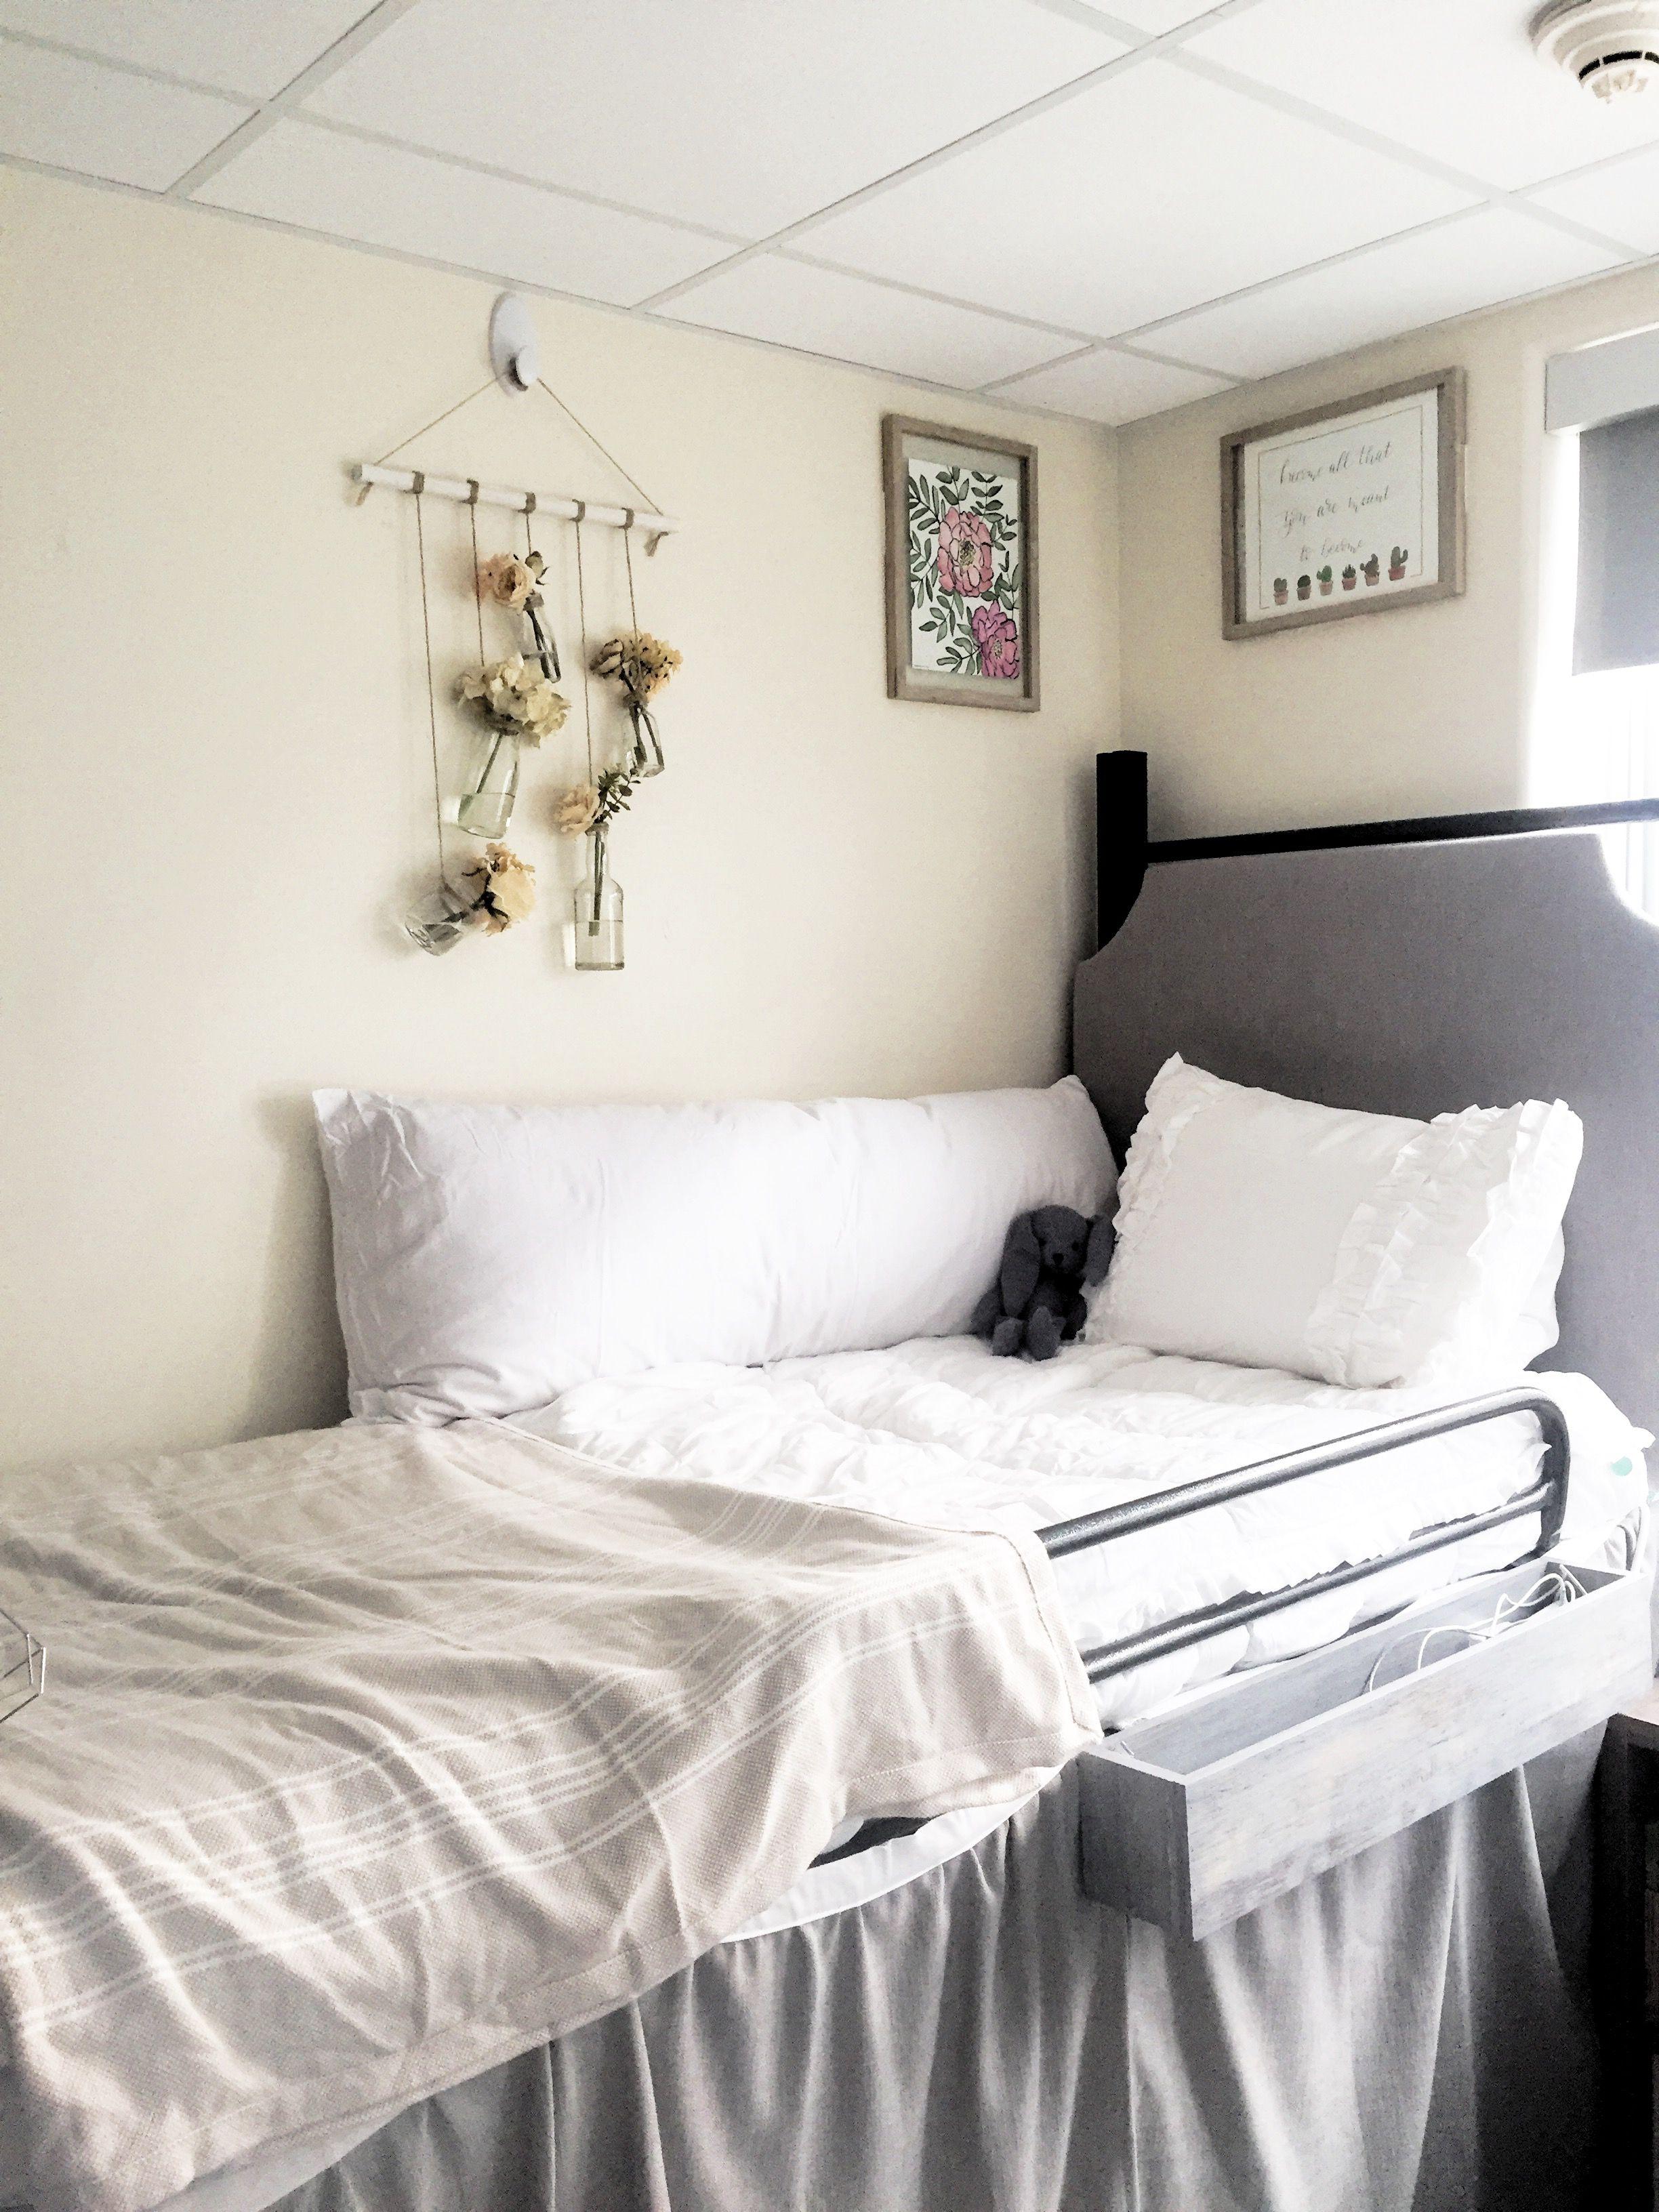 My Dorm Room At The Ohio State University Park Stradley